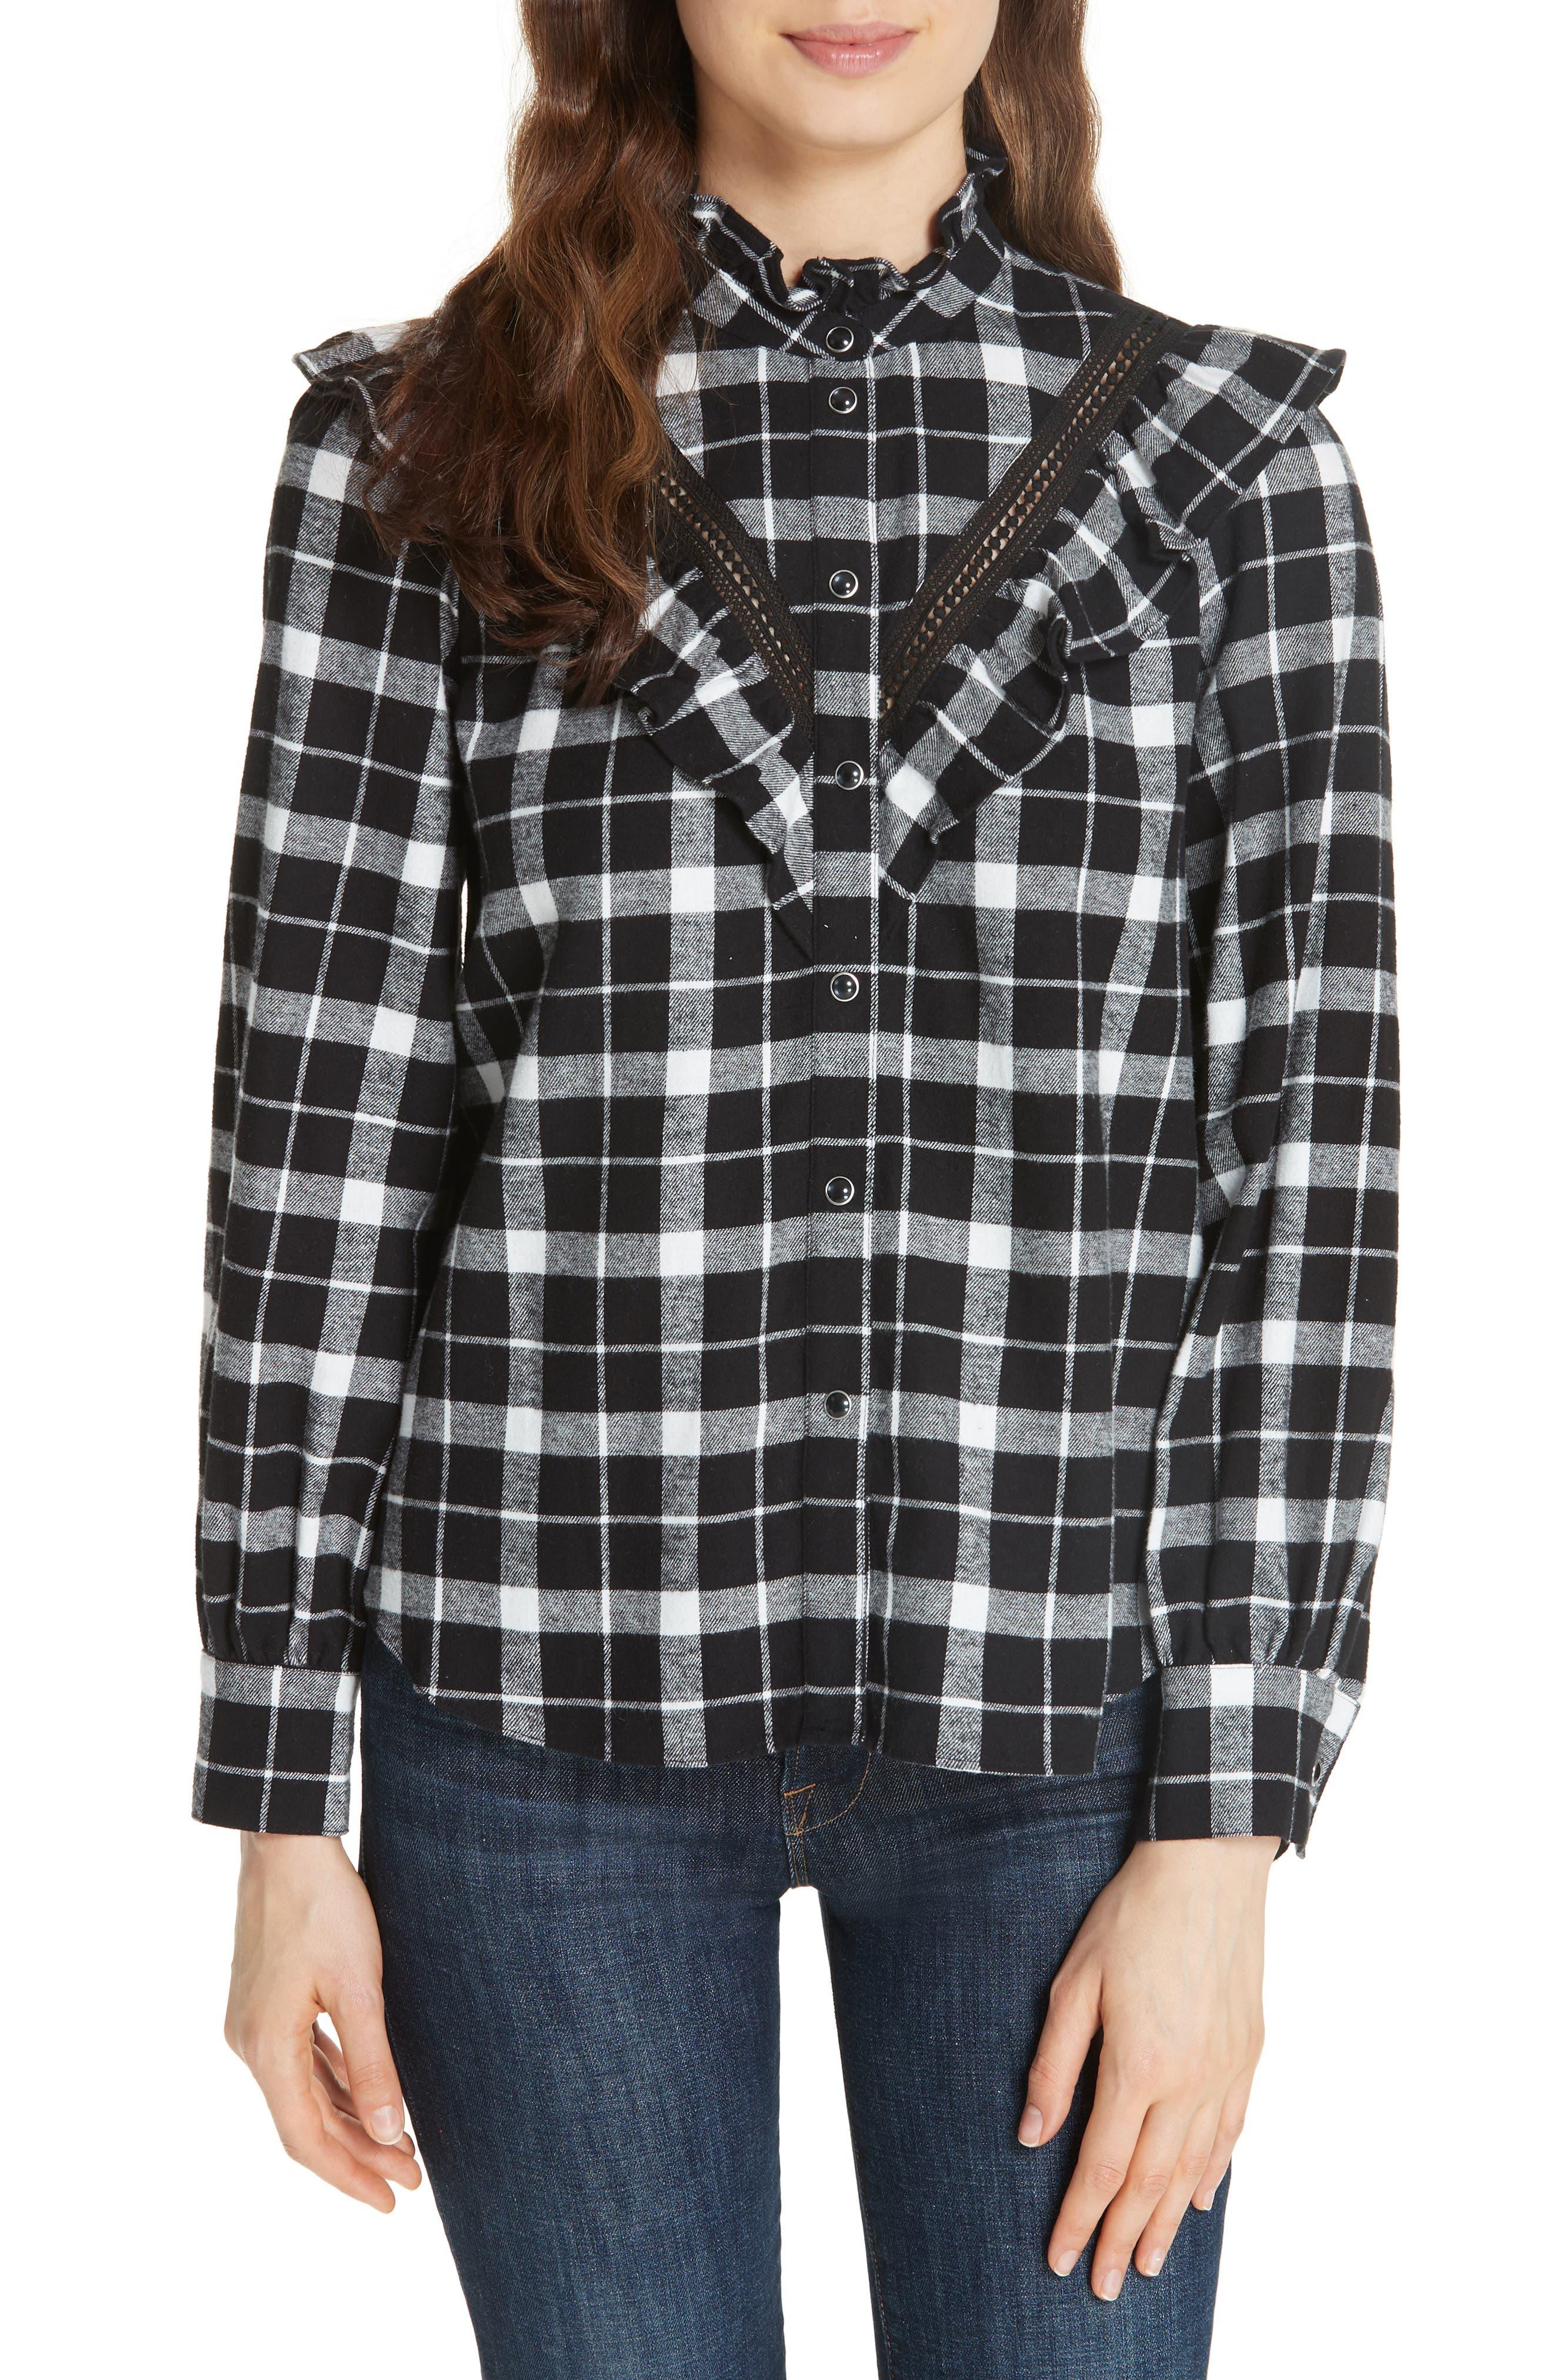 rustic plaid flannel shirt, Main, color, 001